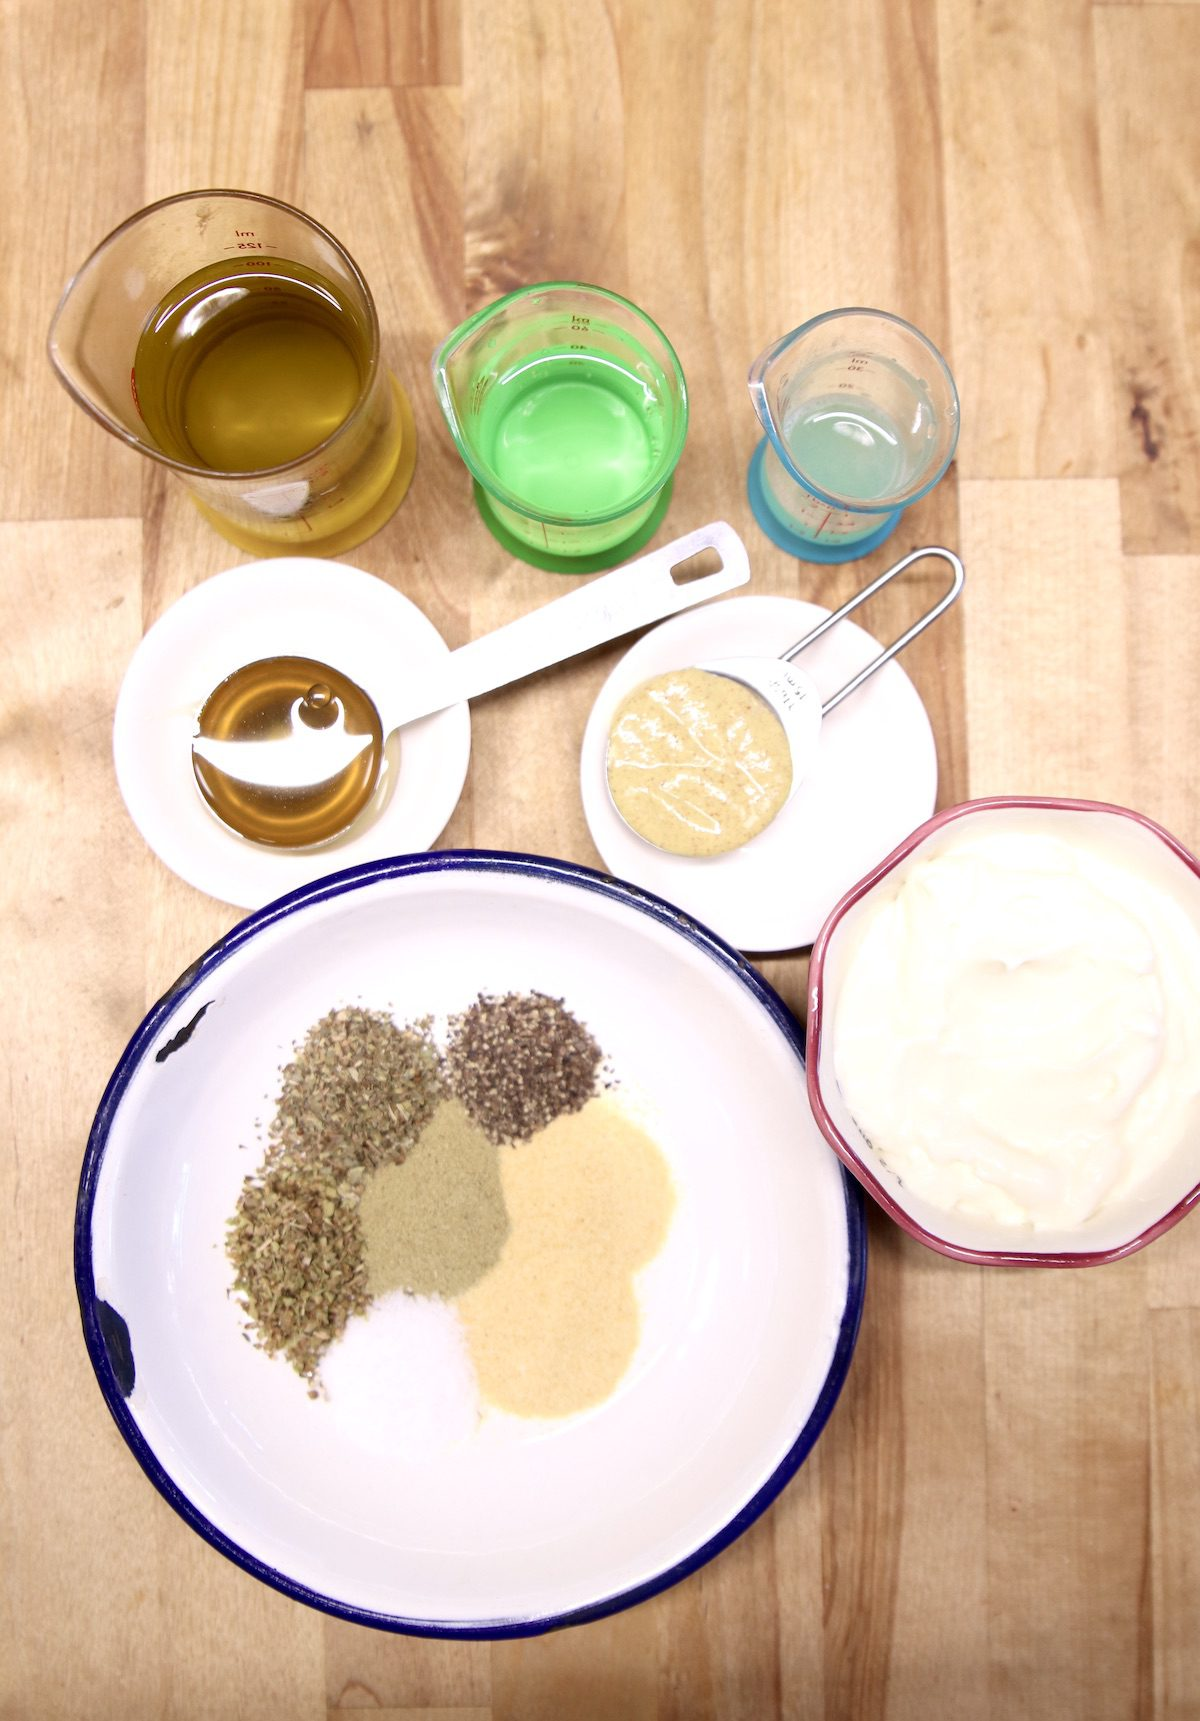 ingredients for creamy Italian sauce